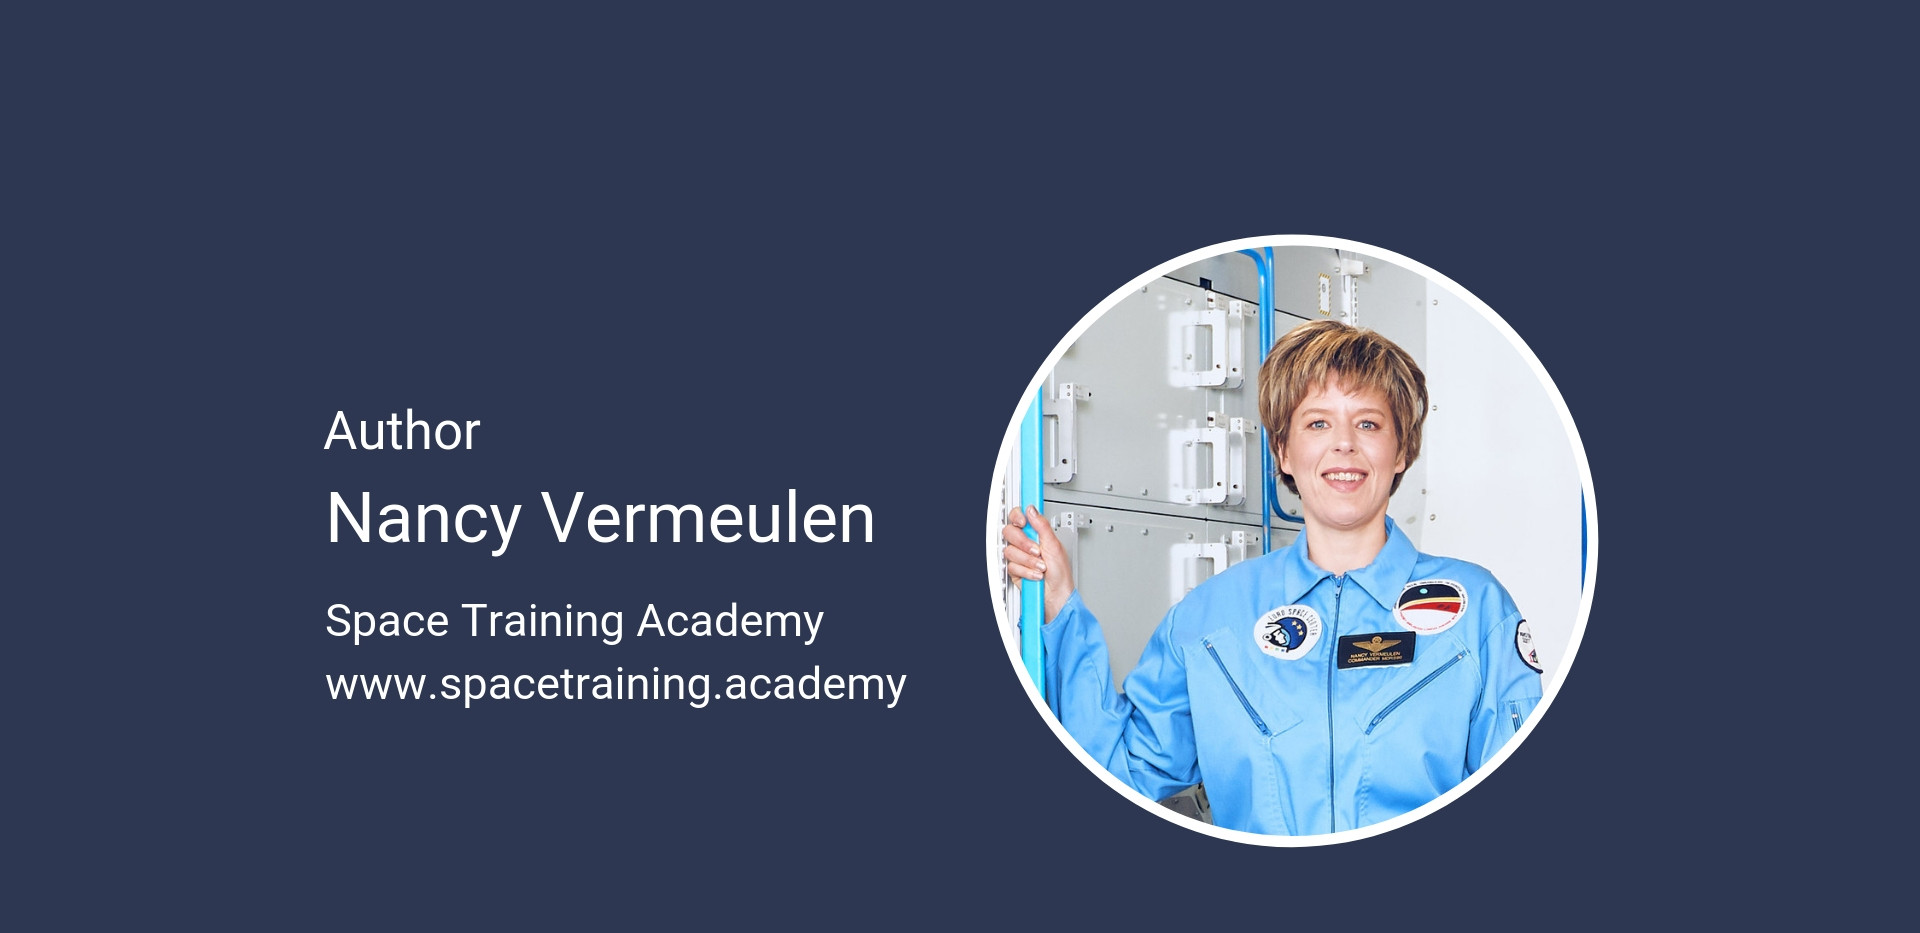 Space Training Academy